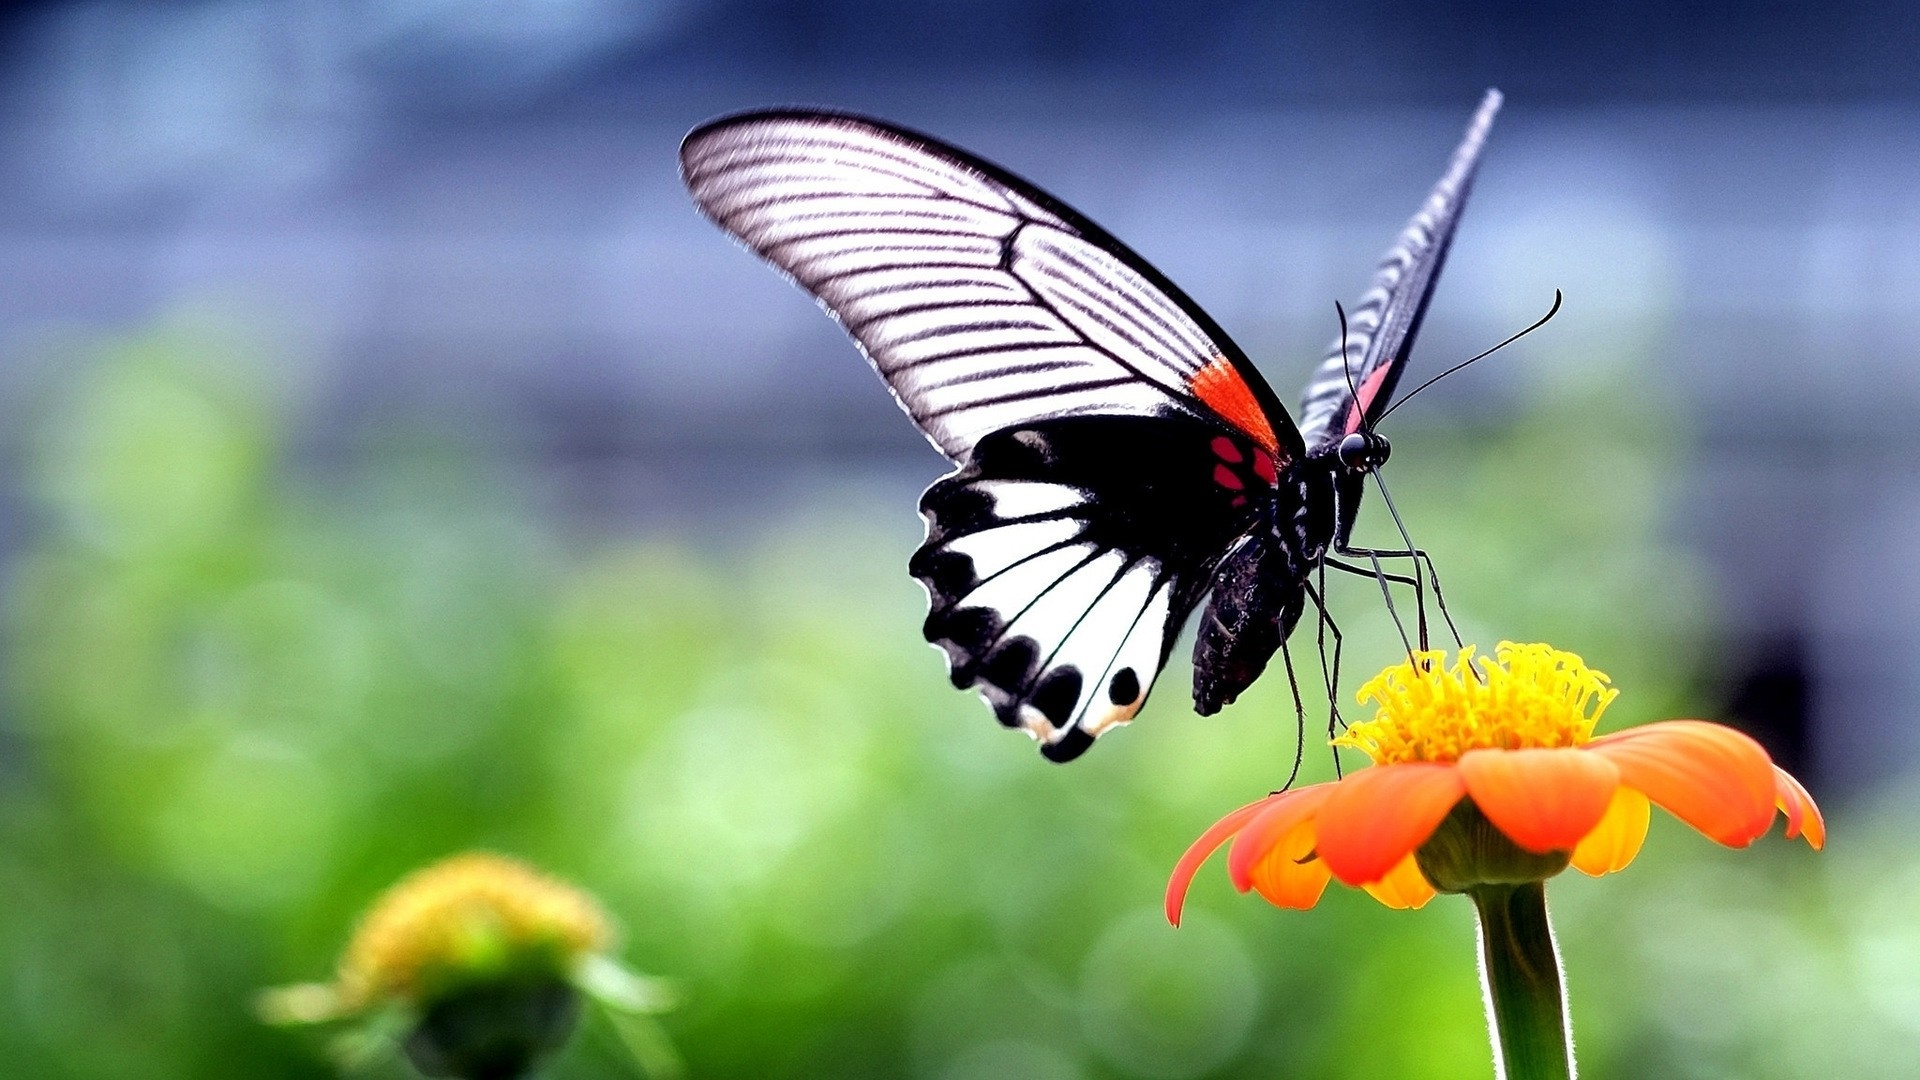 Butterfly On A Flower computer wallpaper